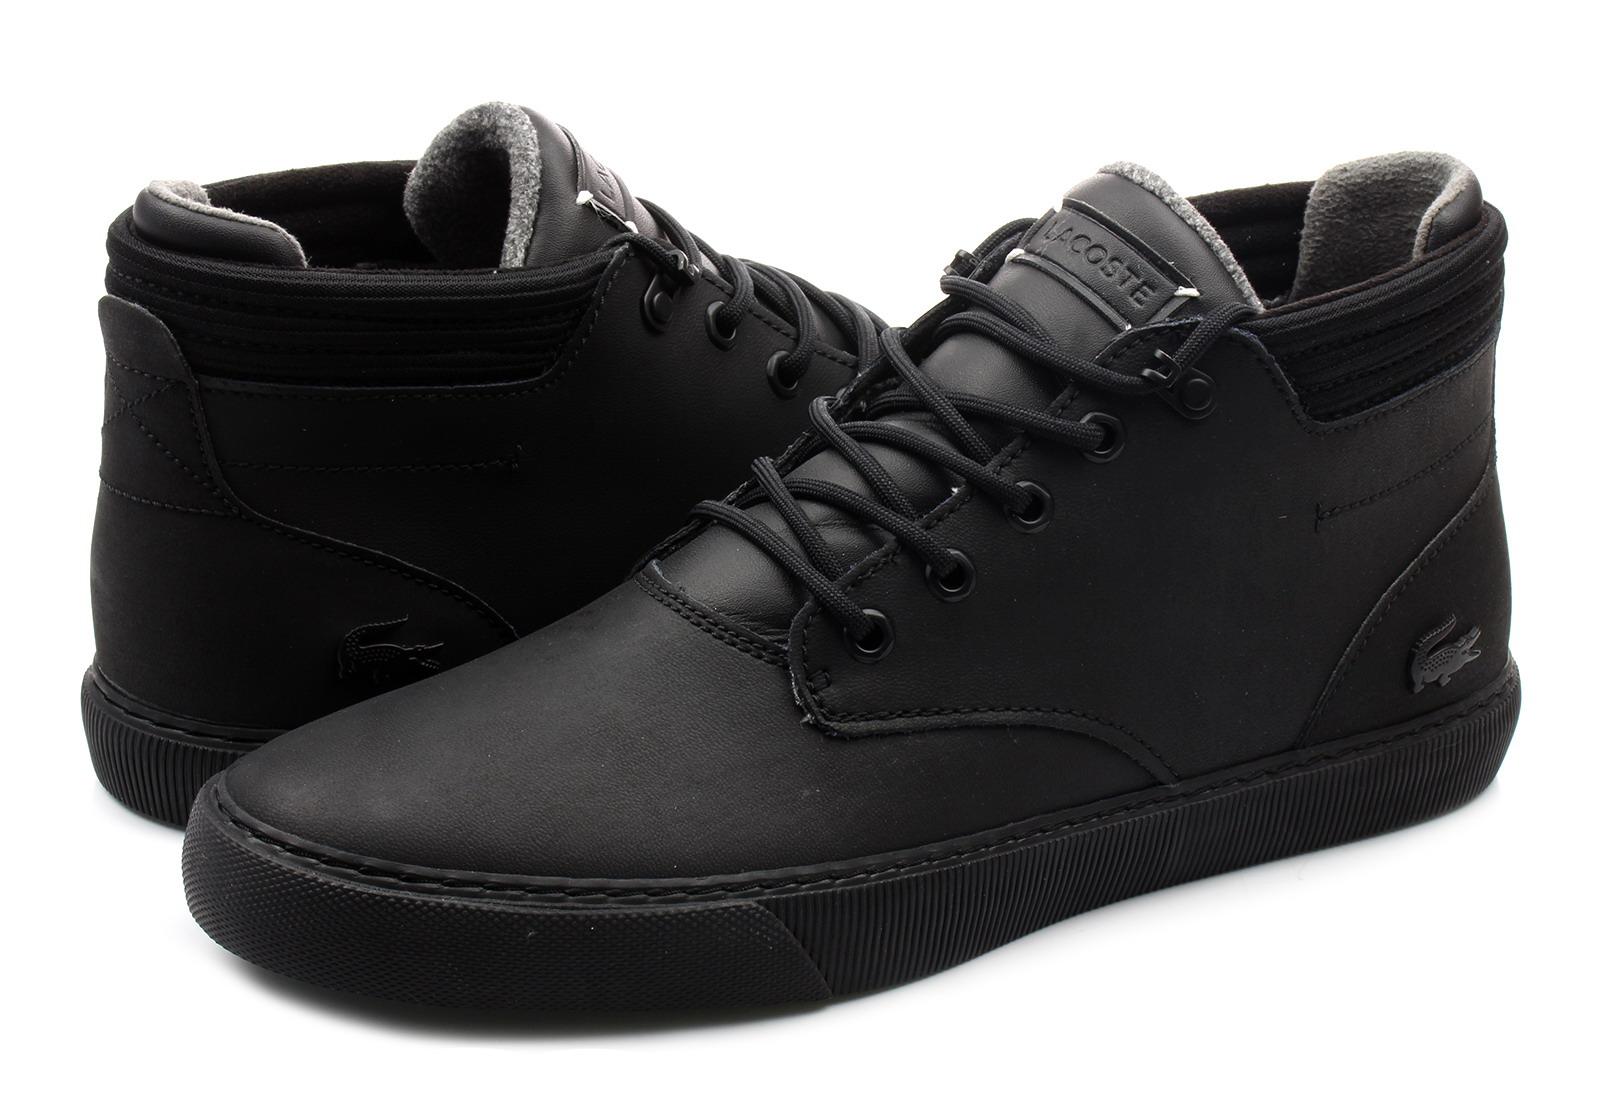 37df2daf7f74 Lacoste Shoes - Esparre Winter - 183CAM0022-02H - Online shop for ...